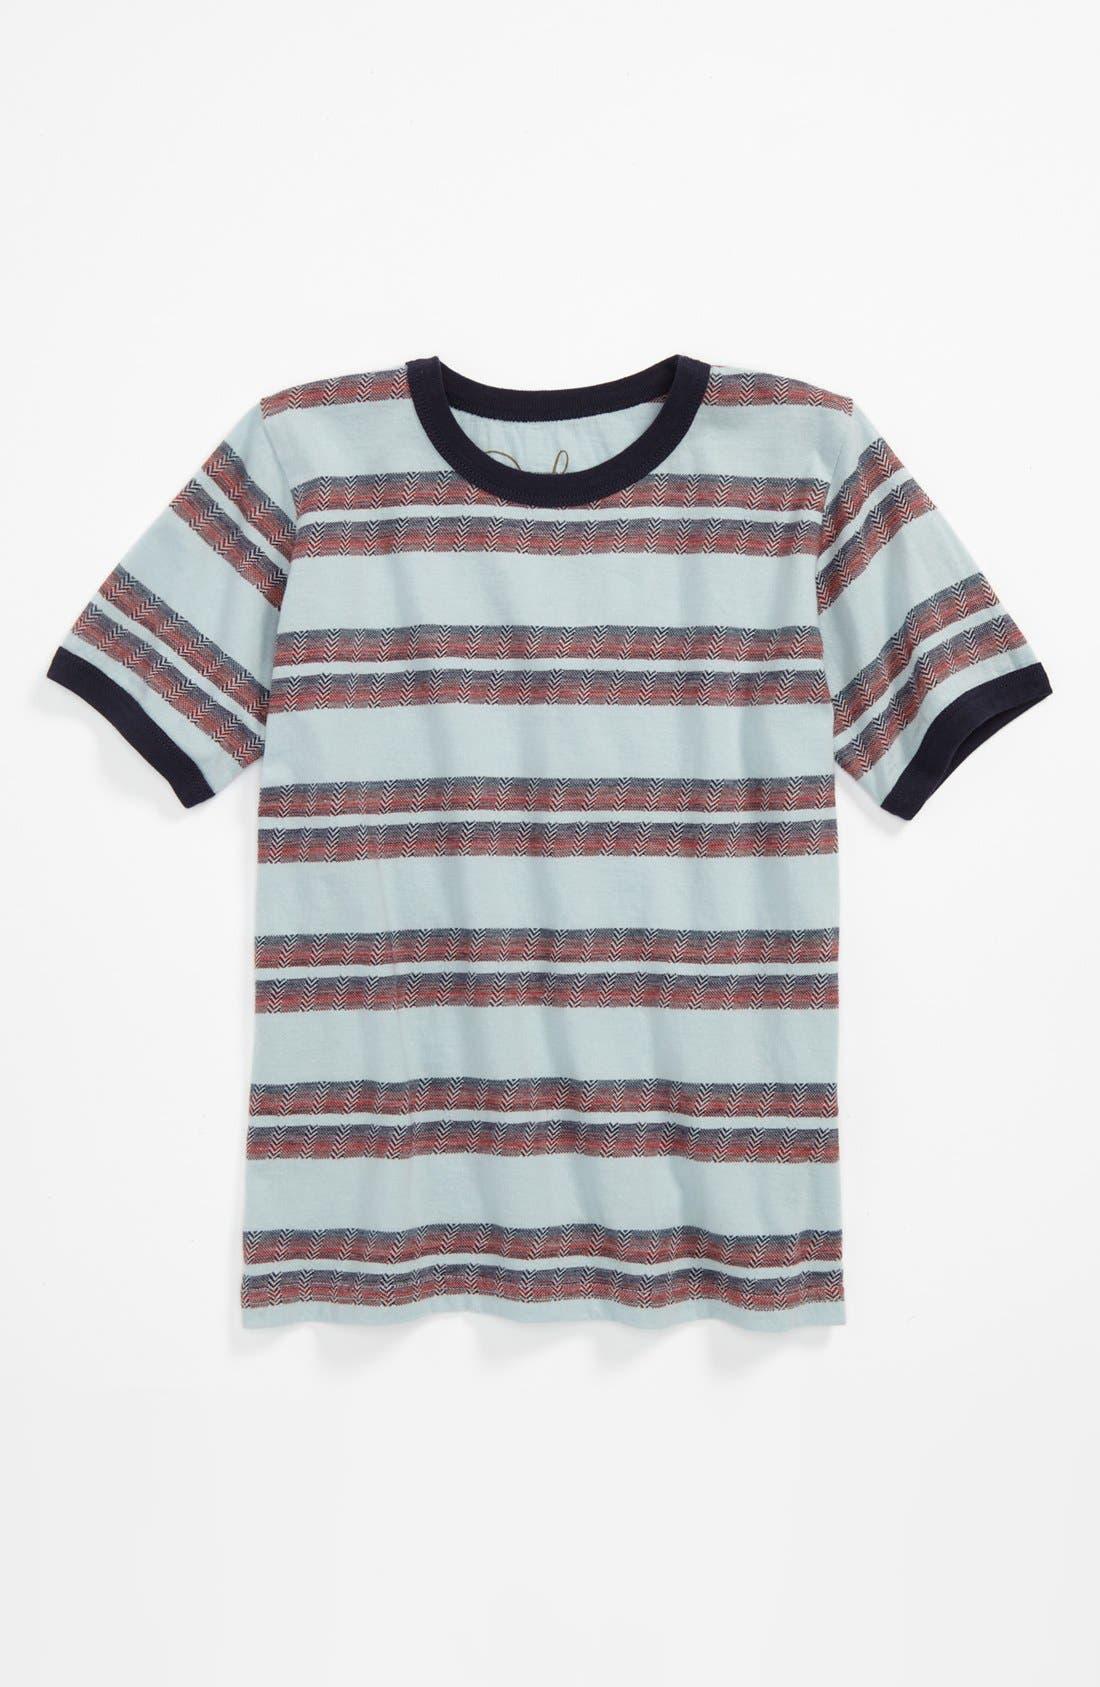 Main Image - Peek 'Mateo' T-Shirt (Big Boys)